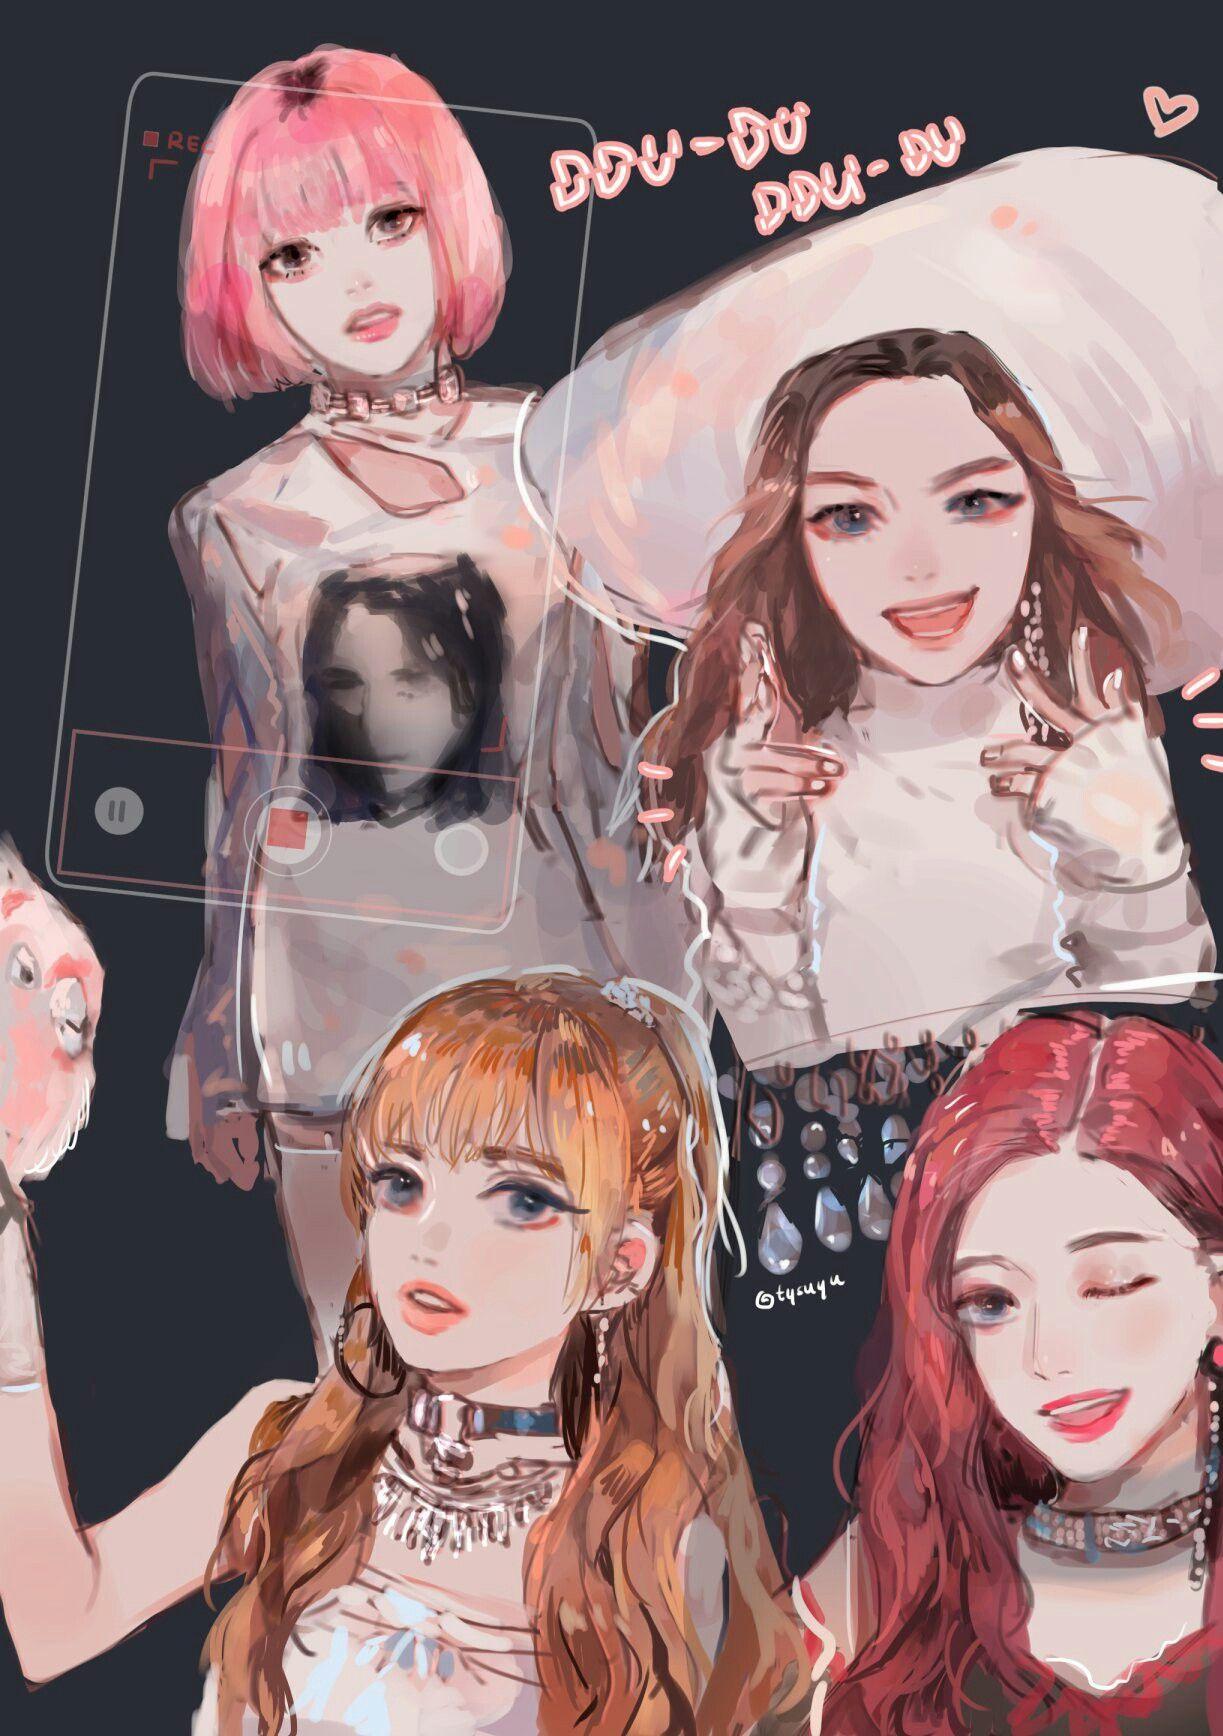 blackpink anime kpop pink pop fan kill jennie wallpapers fanart dessin manga killthislove lockscreen homescreen tto lisa rose korean chibi